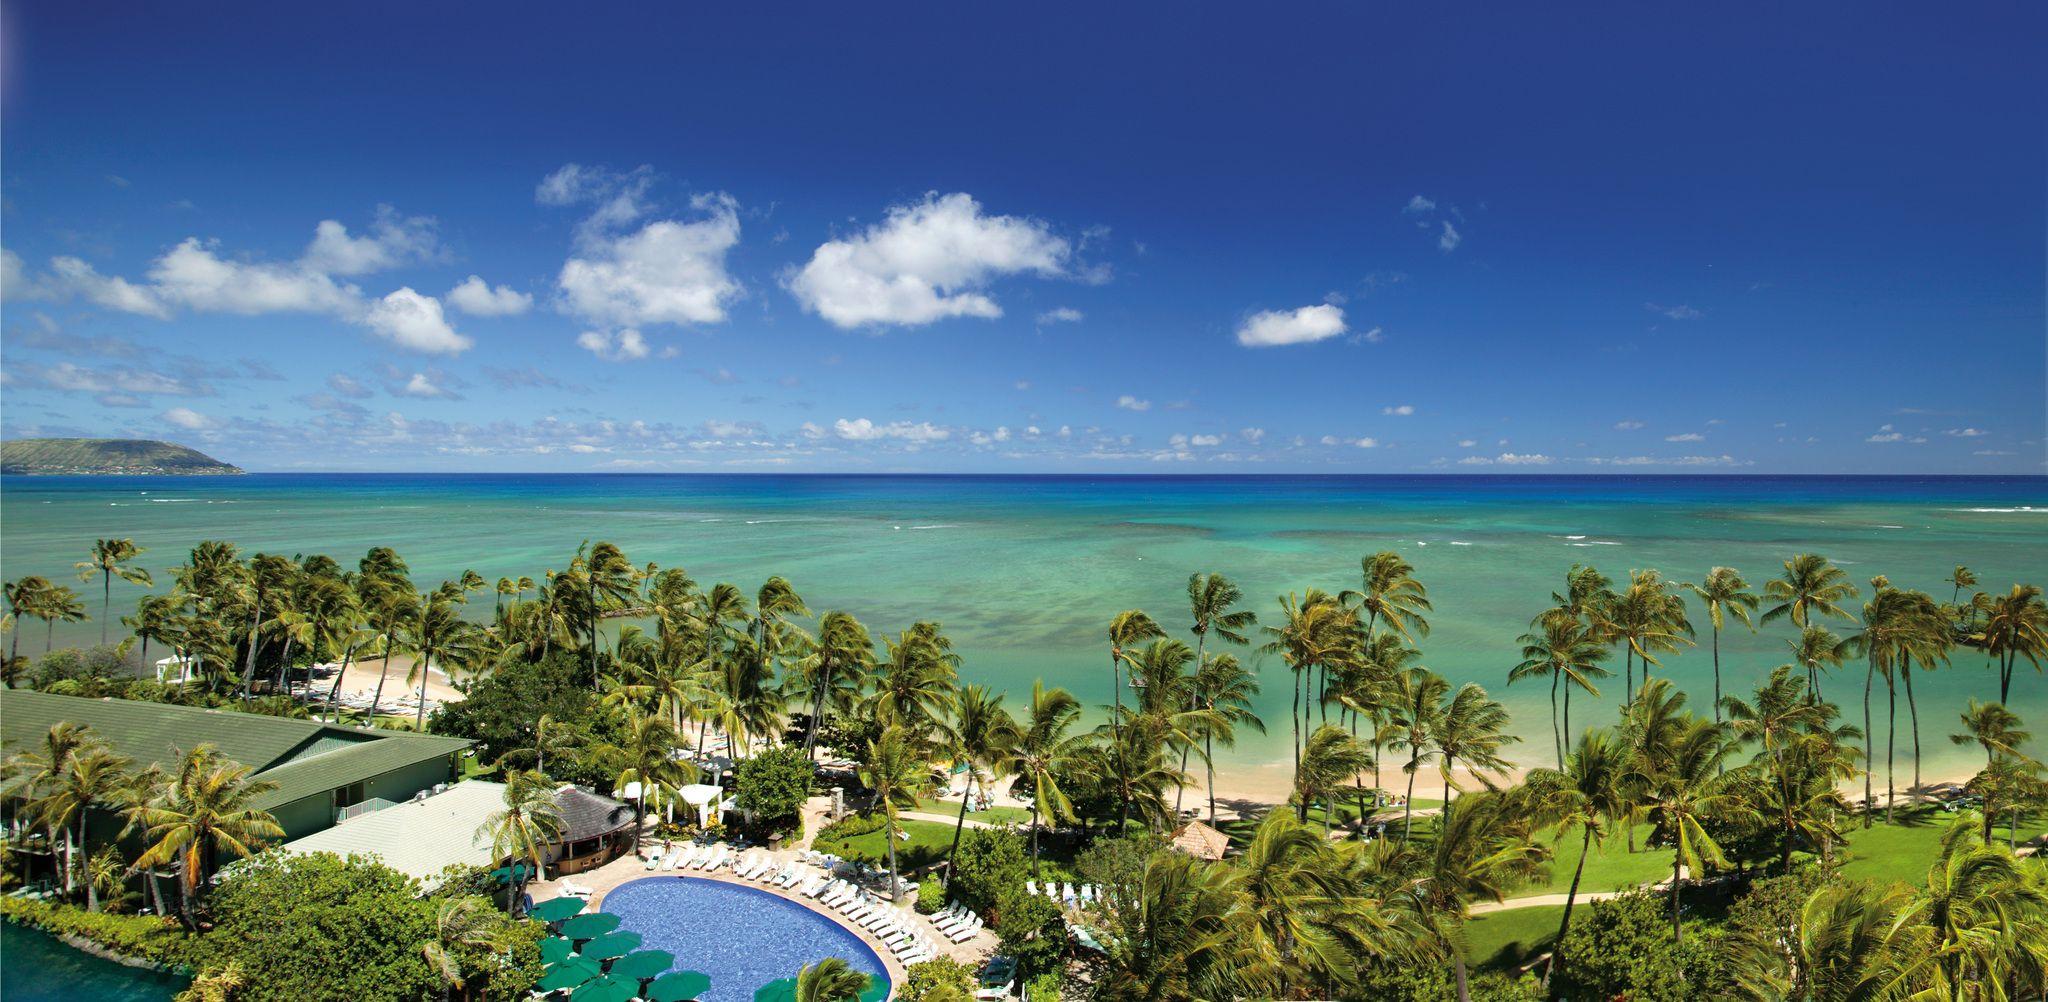 The Kahala Lodge  Resort on Design Locations is